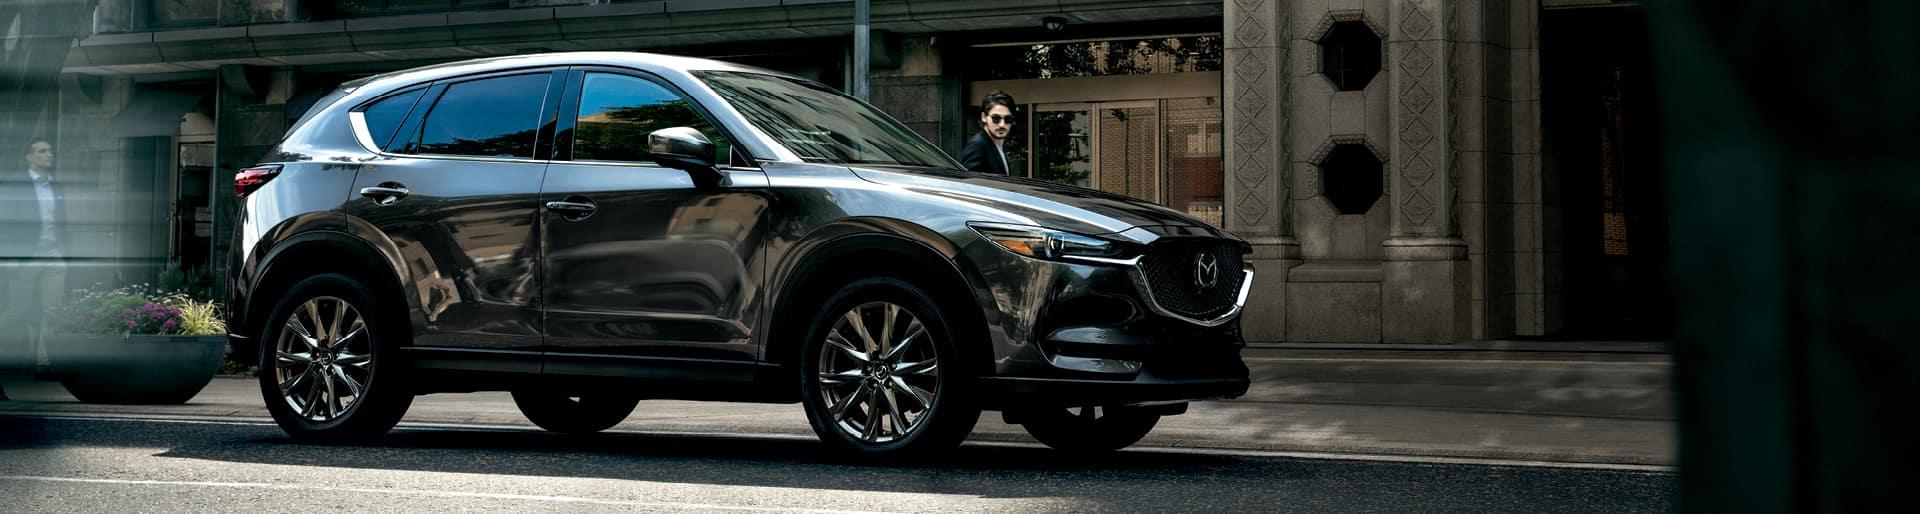 2019 Mazda CX5 exterior